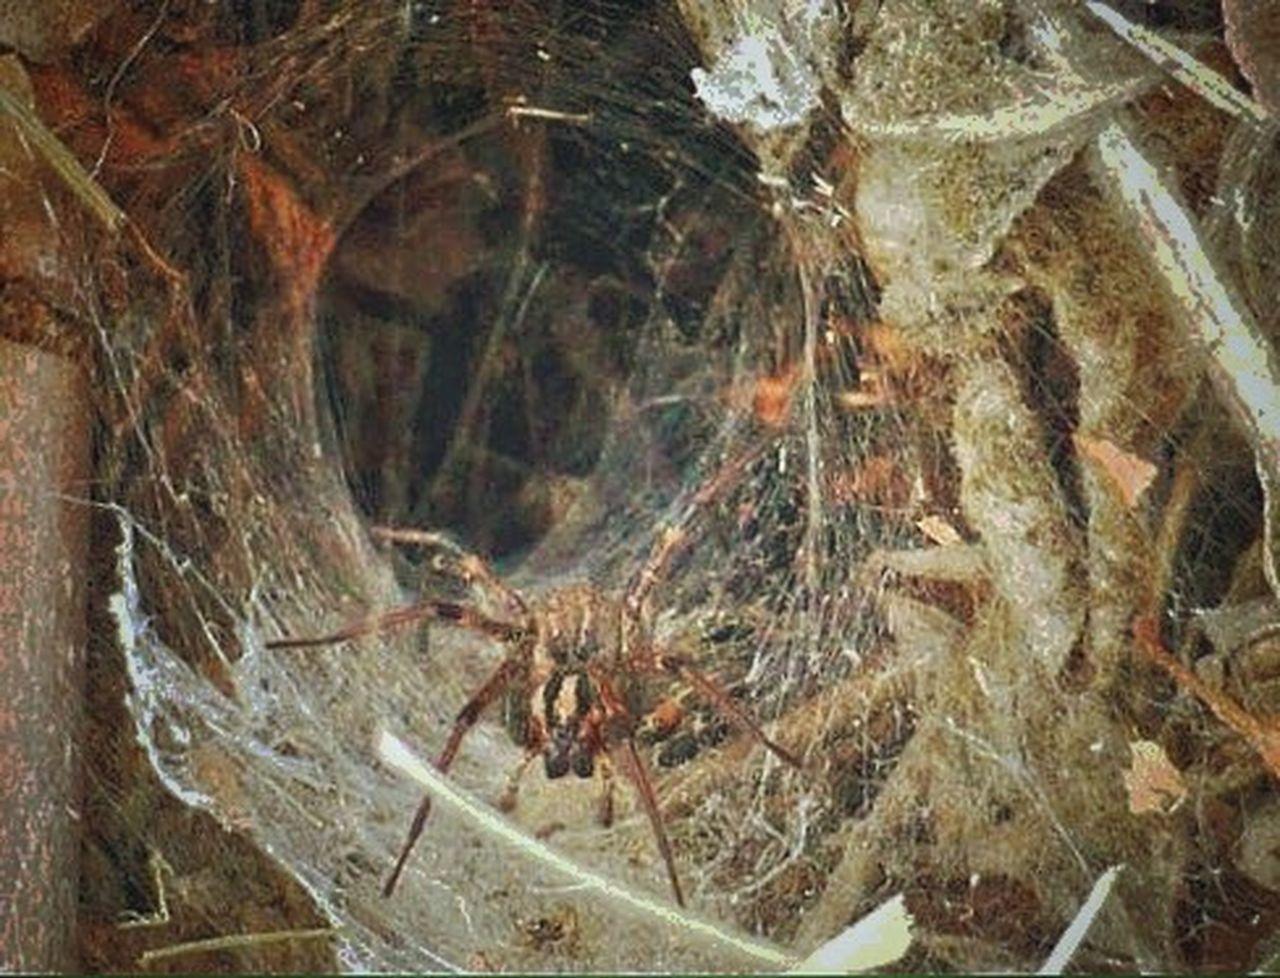 Spider Spiderweb Spider Web Macro Nature Spider Series Arachnid Arachni-therapy Arachnophobia Macro Photography Arachnipocalypse